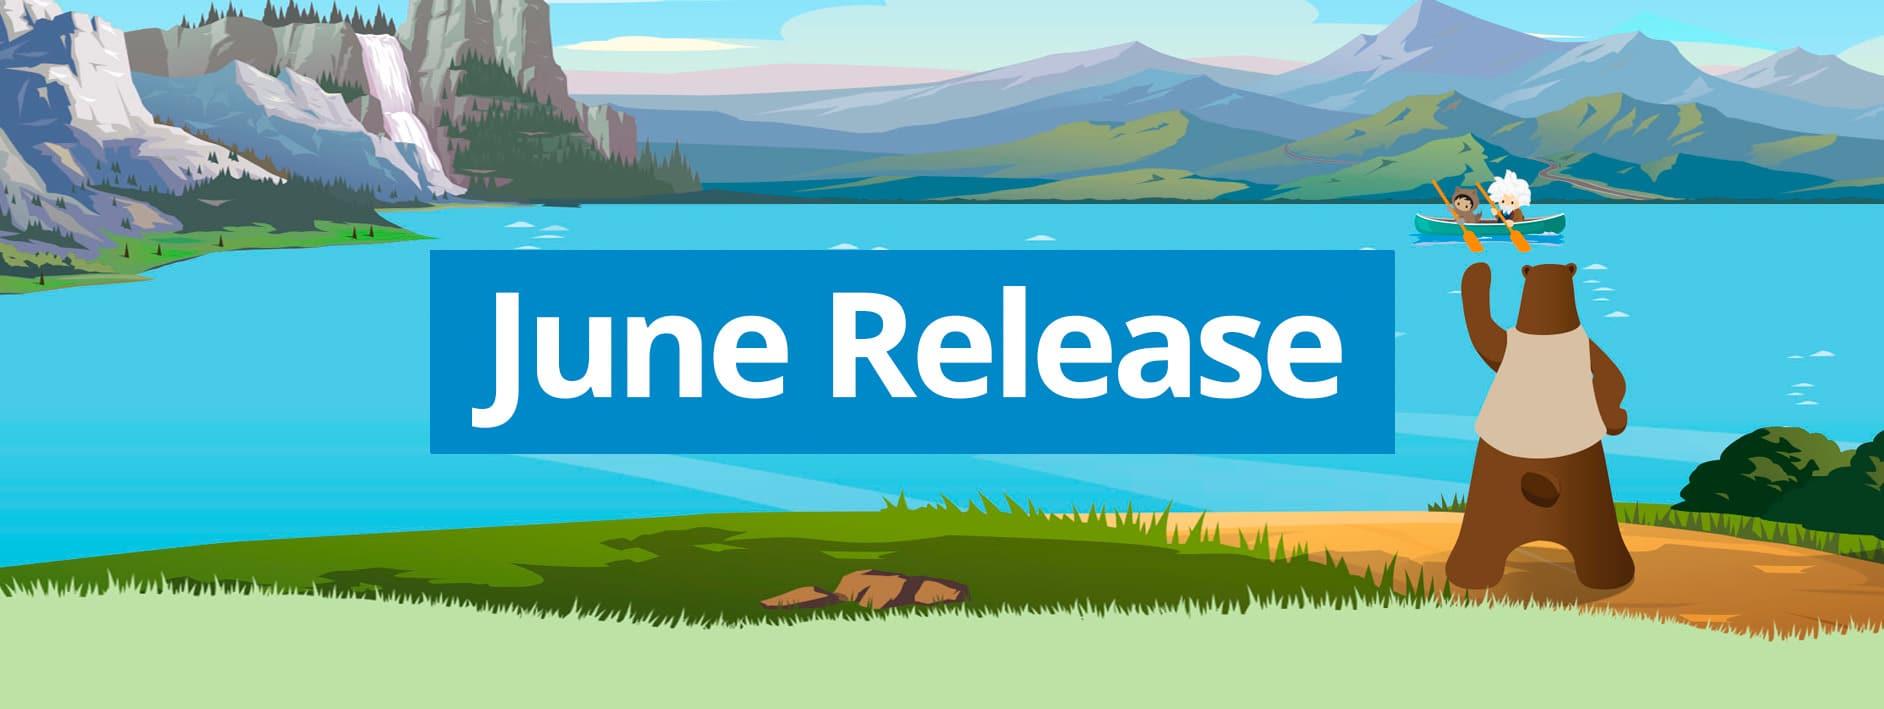 Release Nétive VMS june